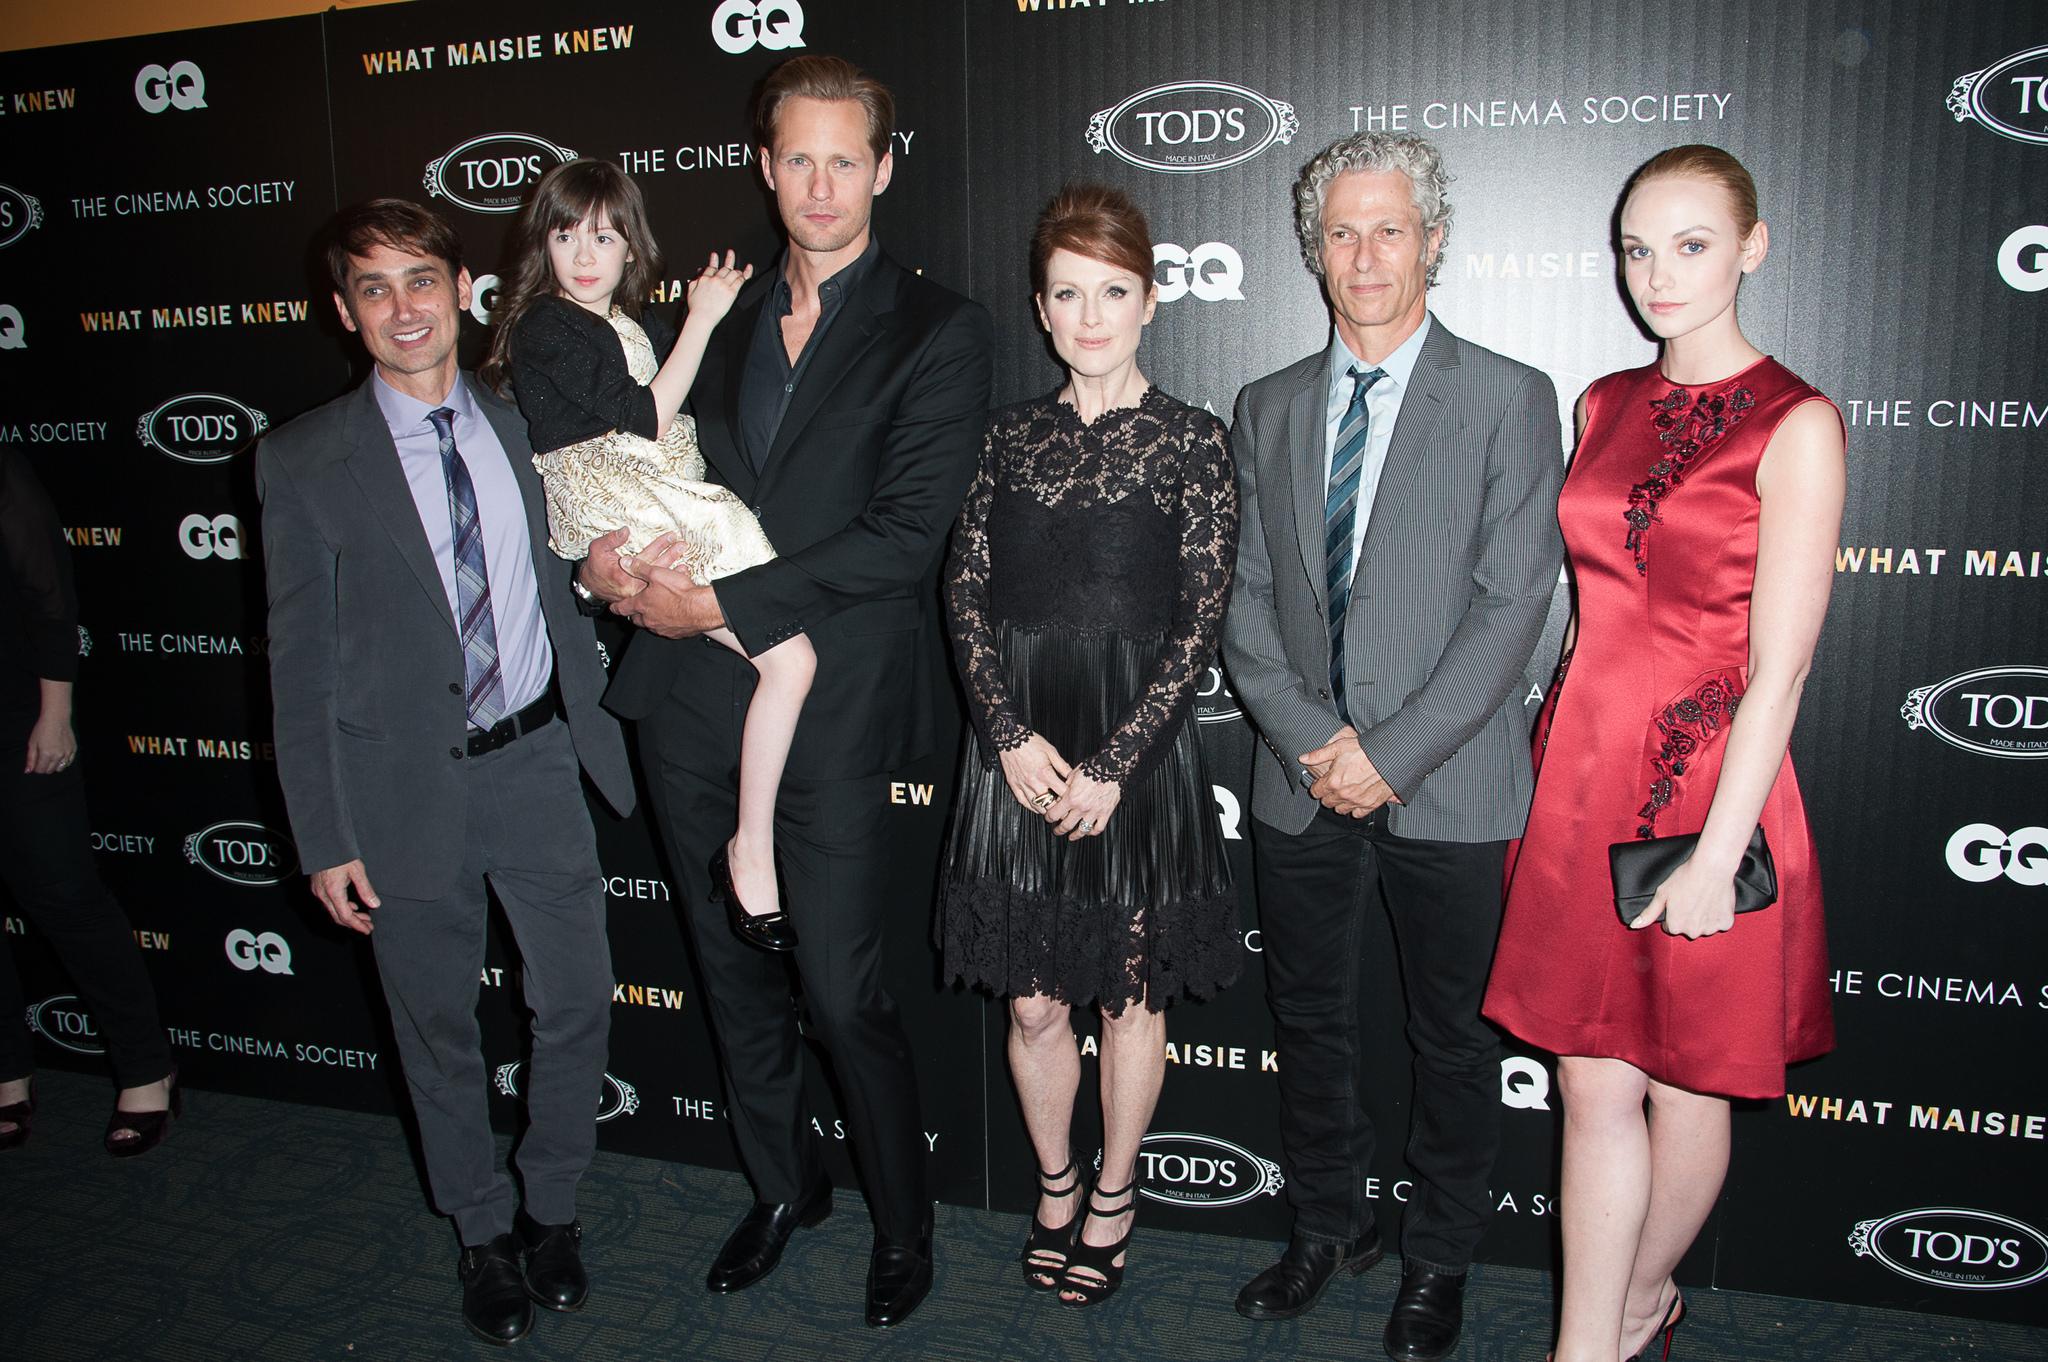 Julianne Moore, Alexander Skarsgård, Scott McGehee, David Siegel, Joanna Vanderham, and Onata Aprile at an event for What Maisie Knew (2012)